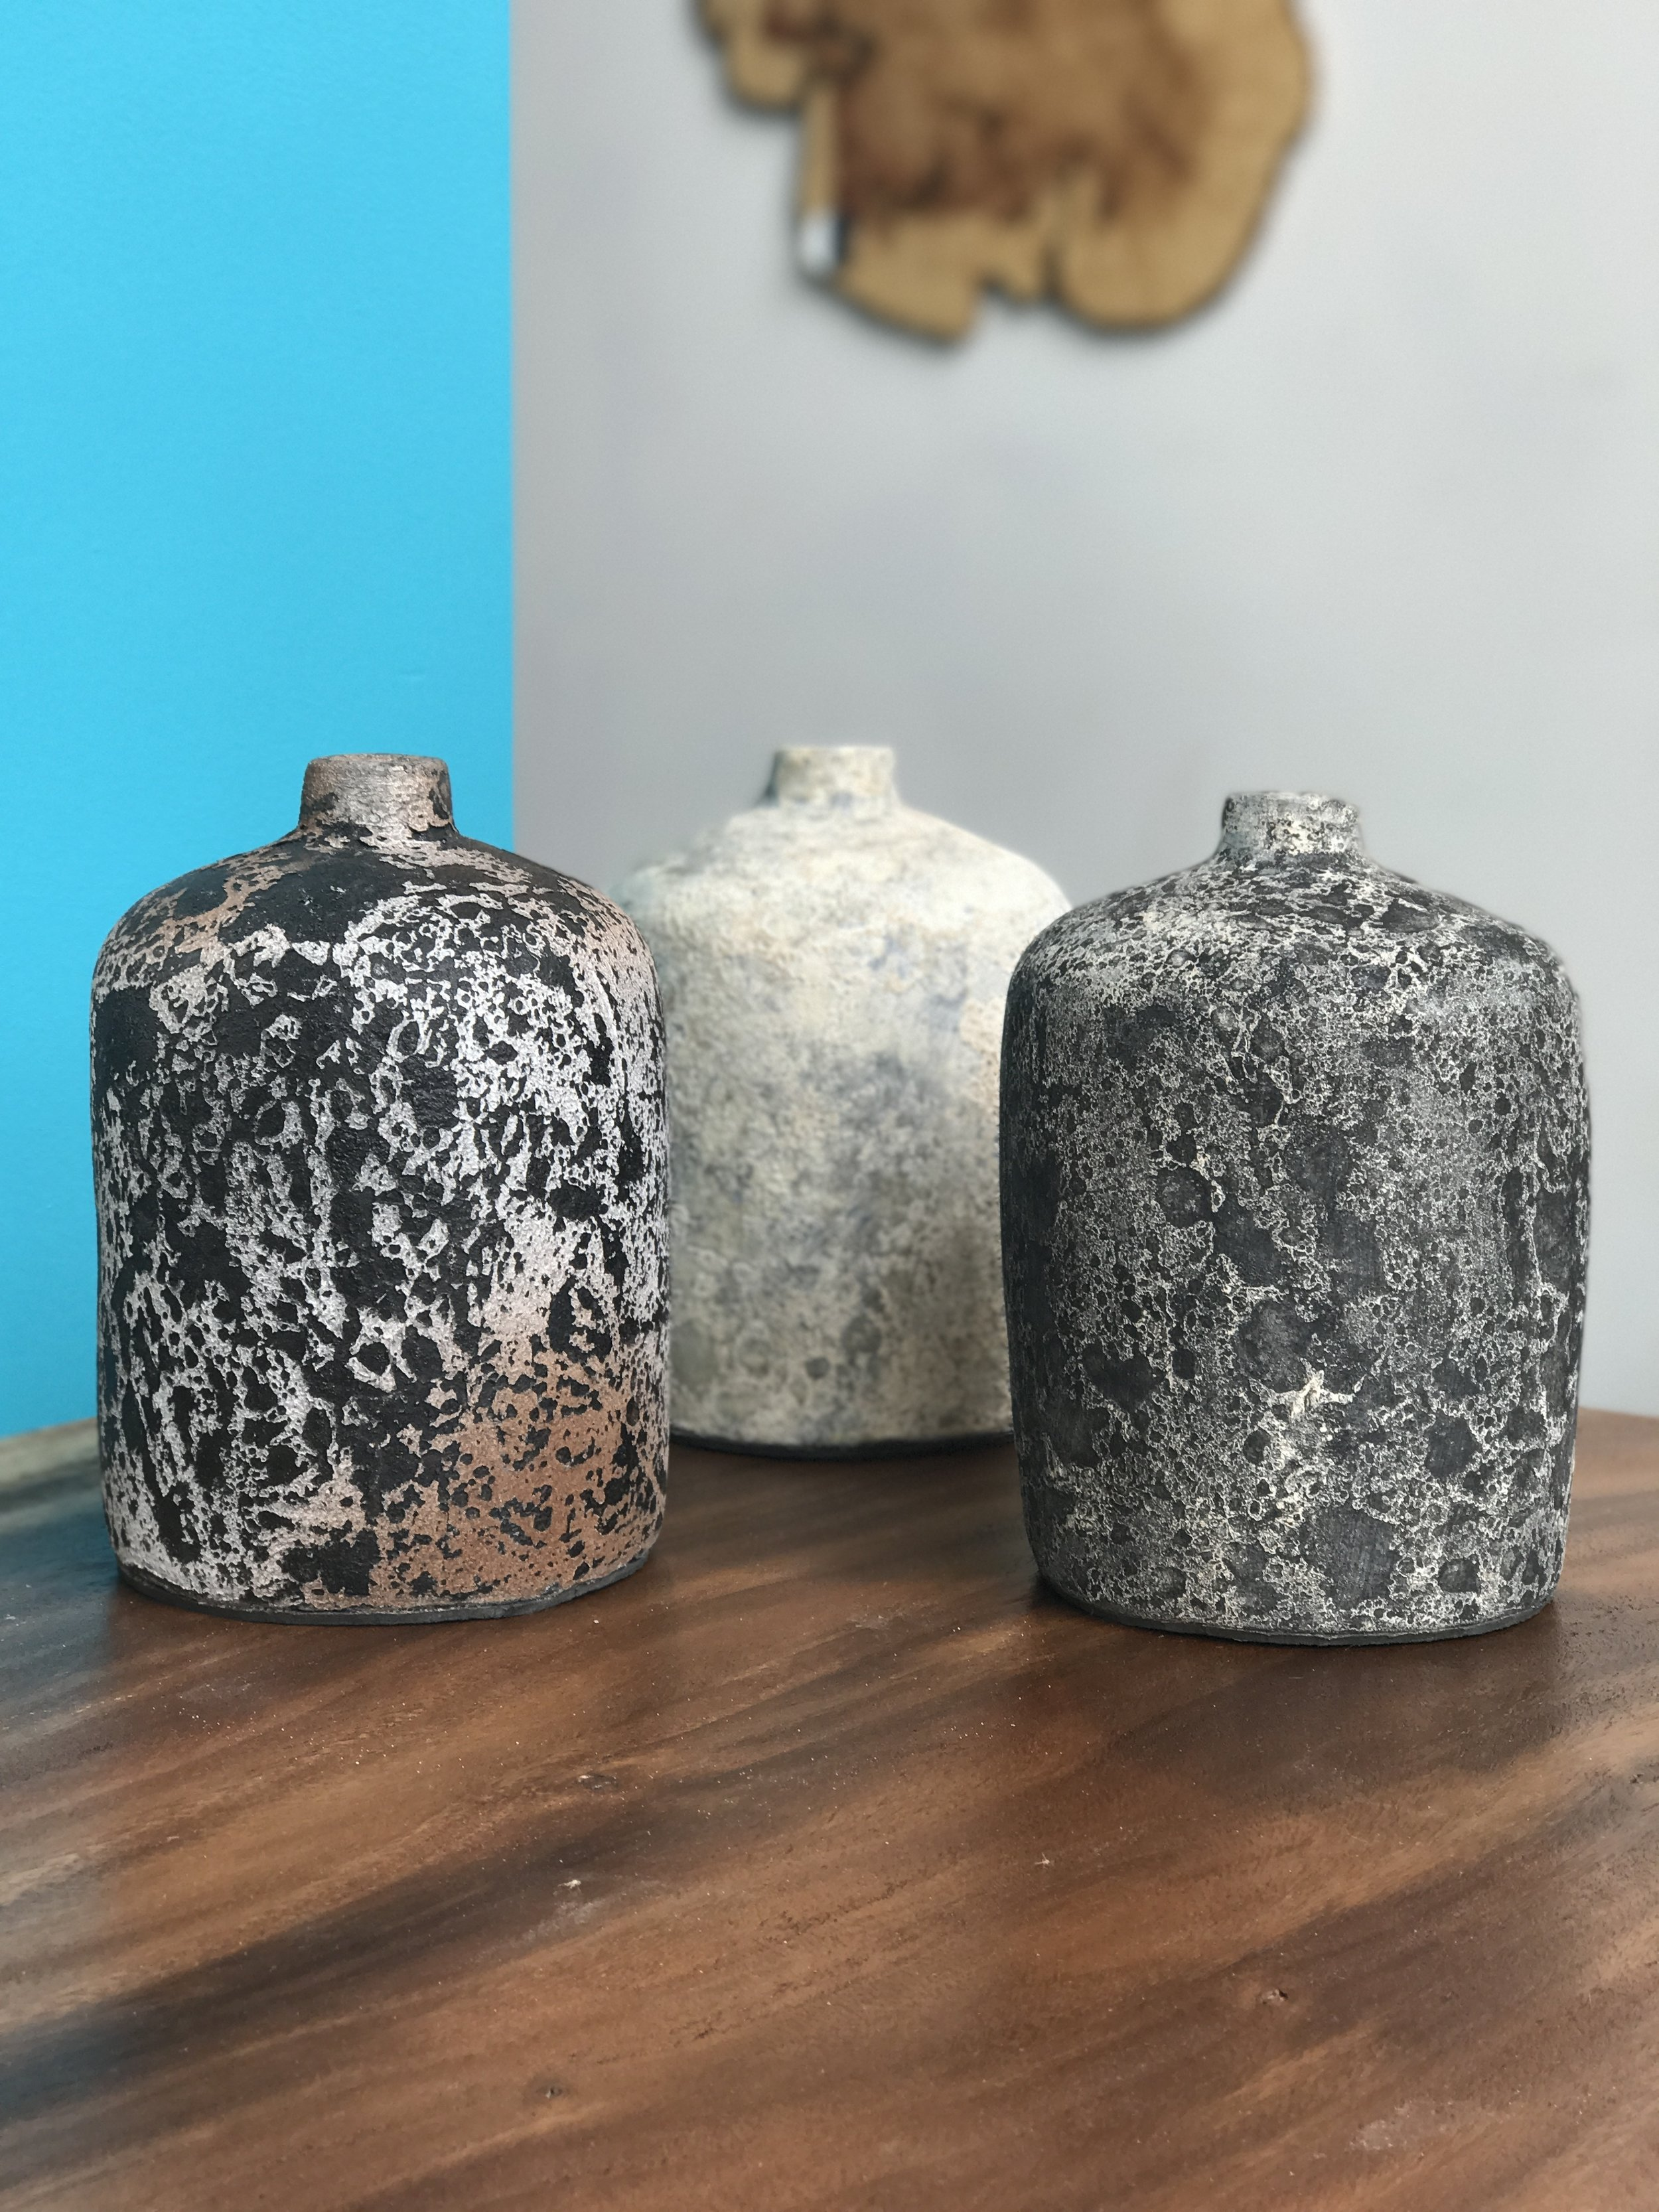 Copy of artifact decorative pots